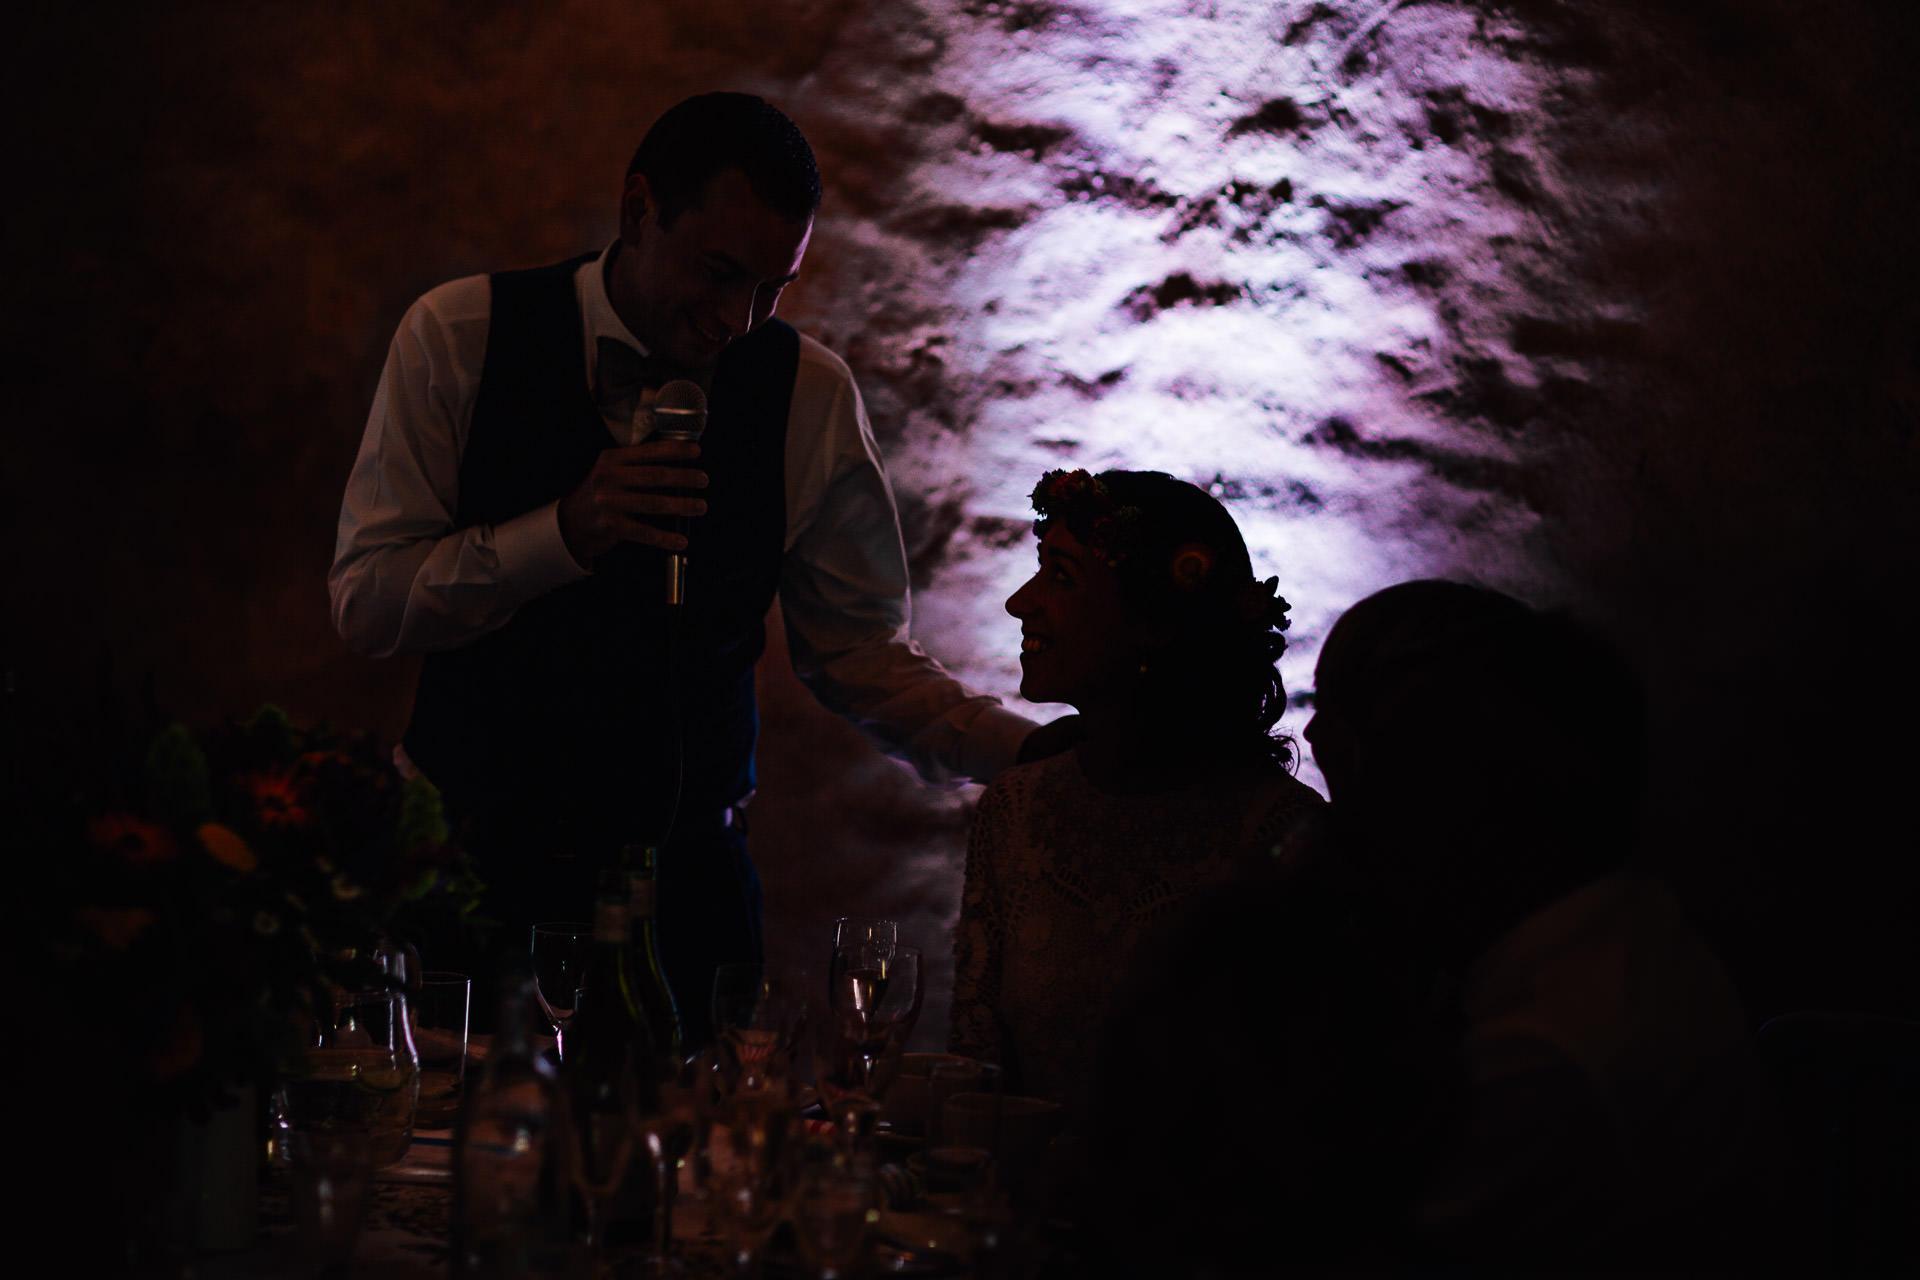 winterbourne-medieval-barn-wedding-photography-emma-andrew-103